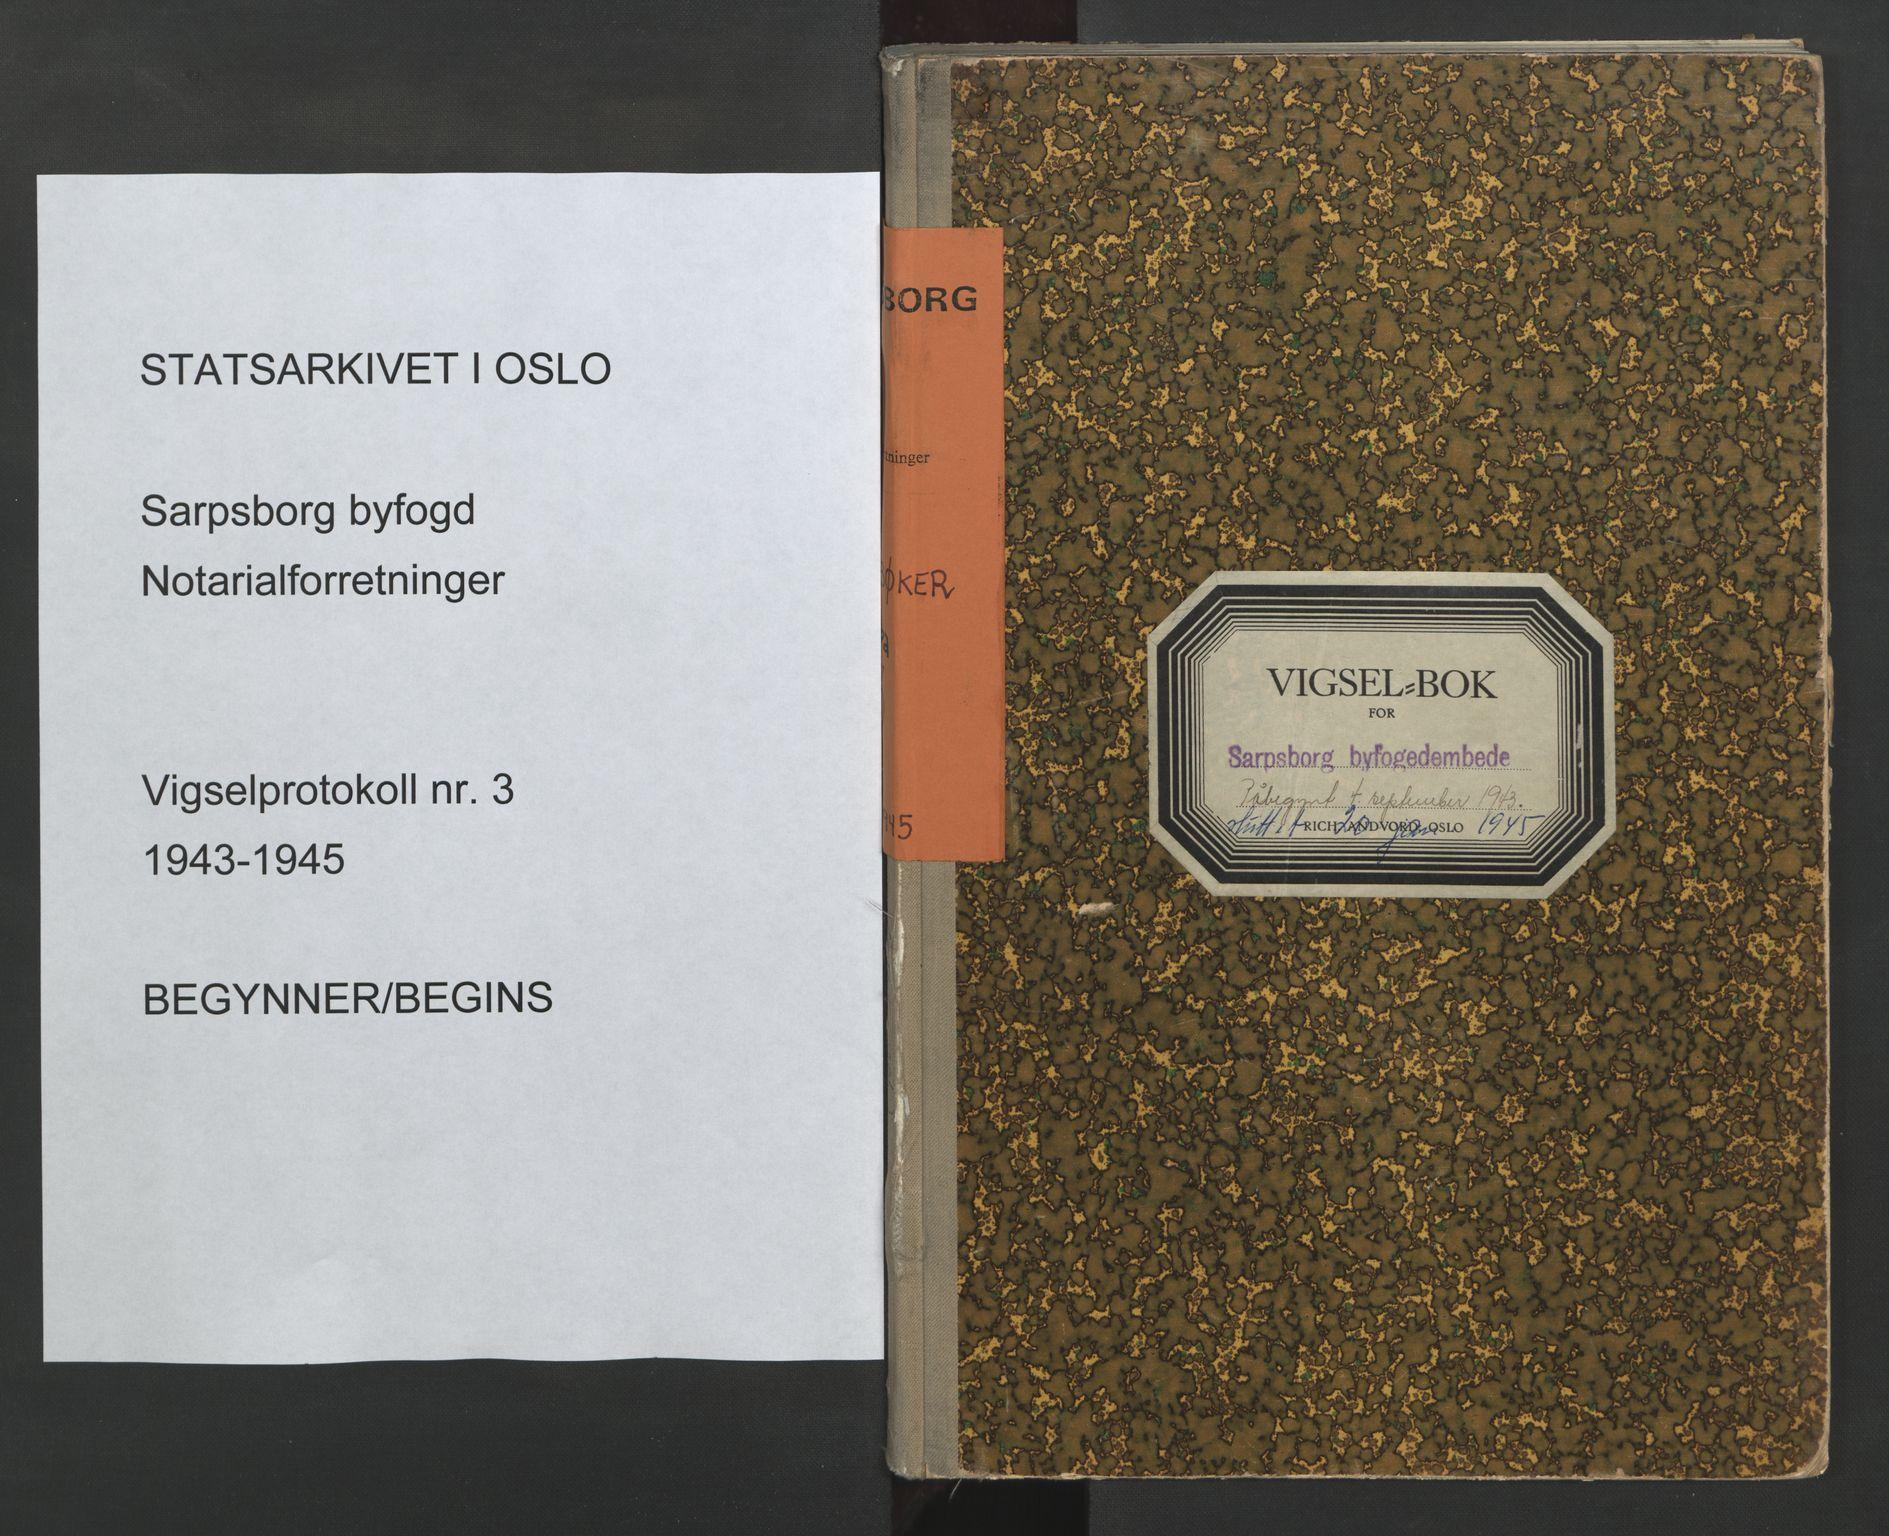 SAO, Sarpsborg byfogd, L/Lb/Lba/L0003: Vigselbok, 1943-1945, s. upaginert